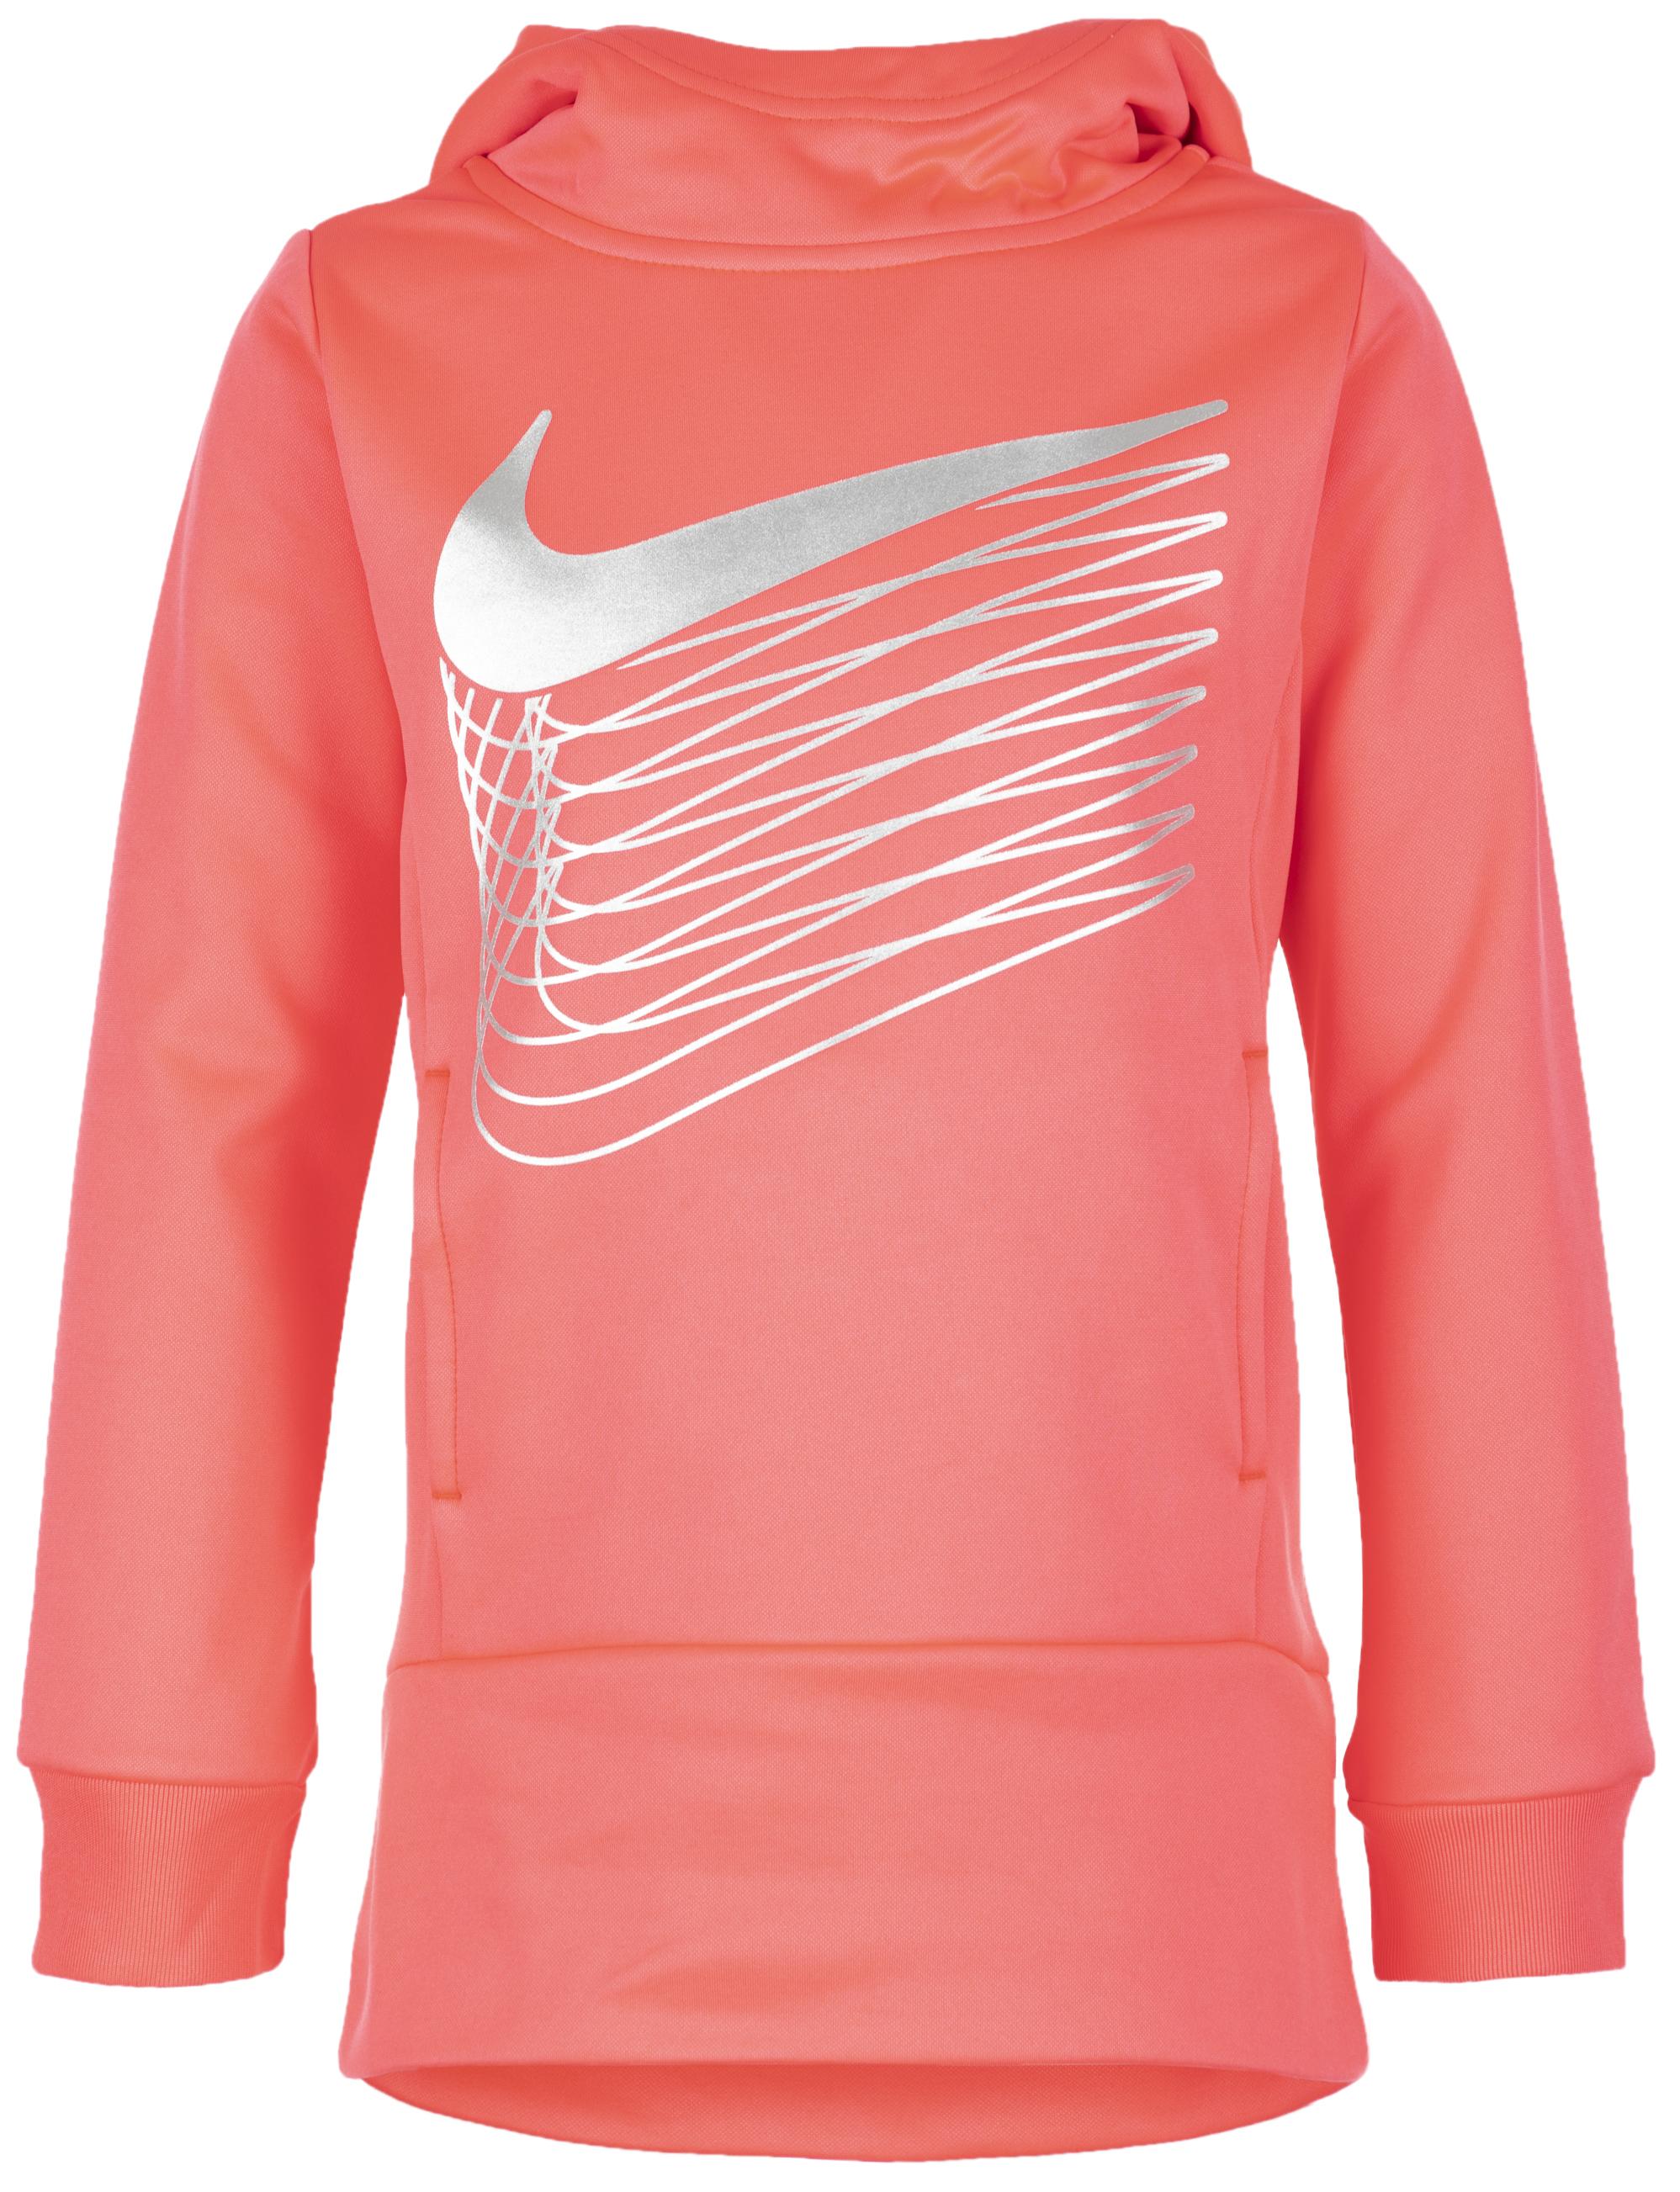 Nike Свитшот для девочек Therma, размер 122